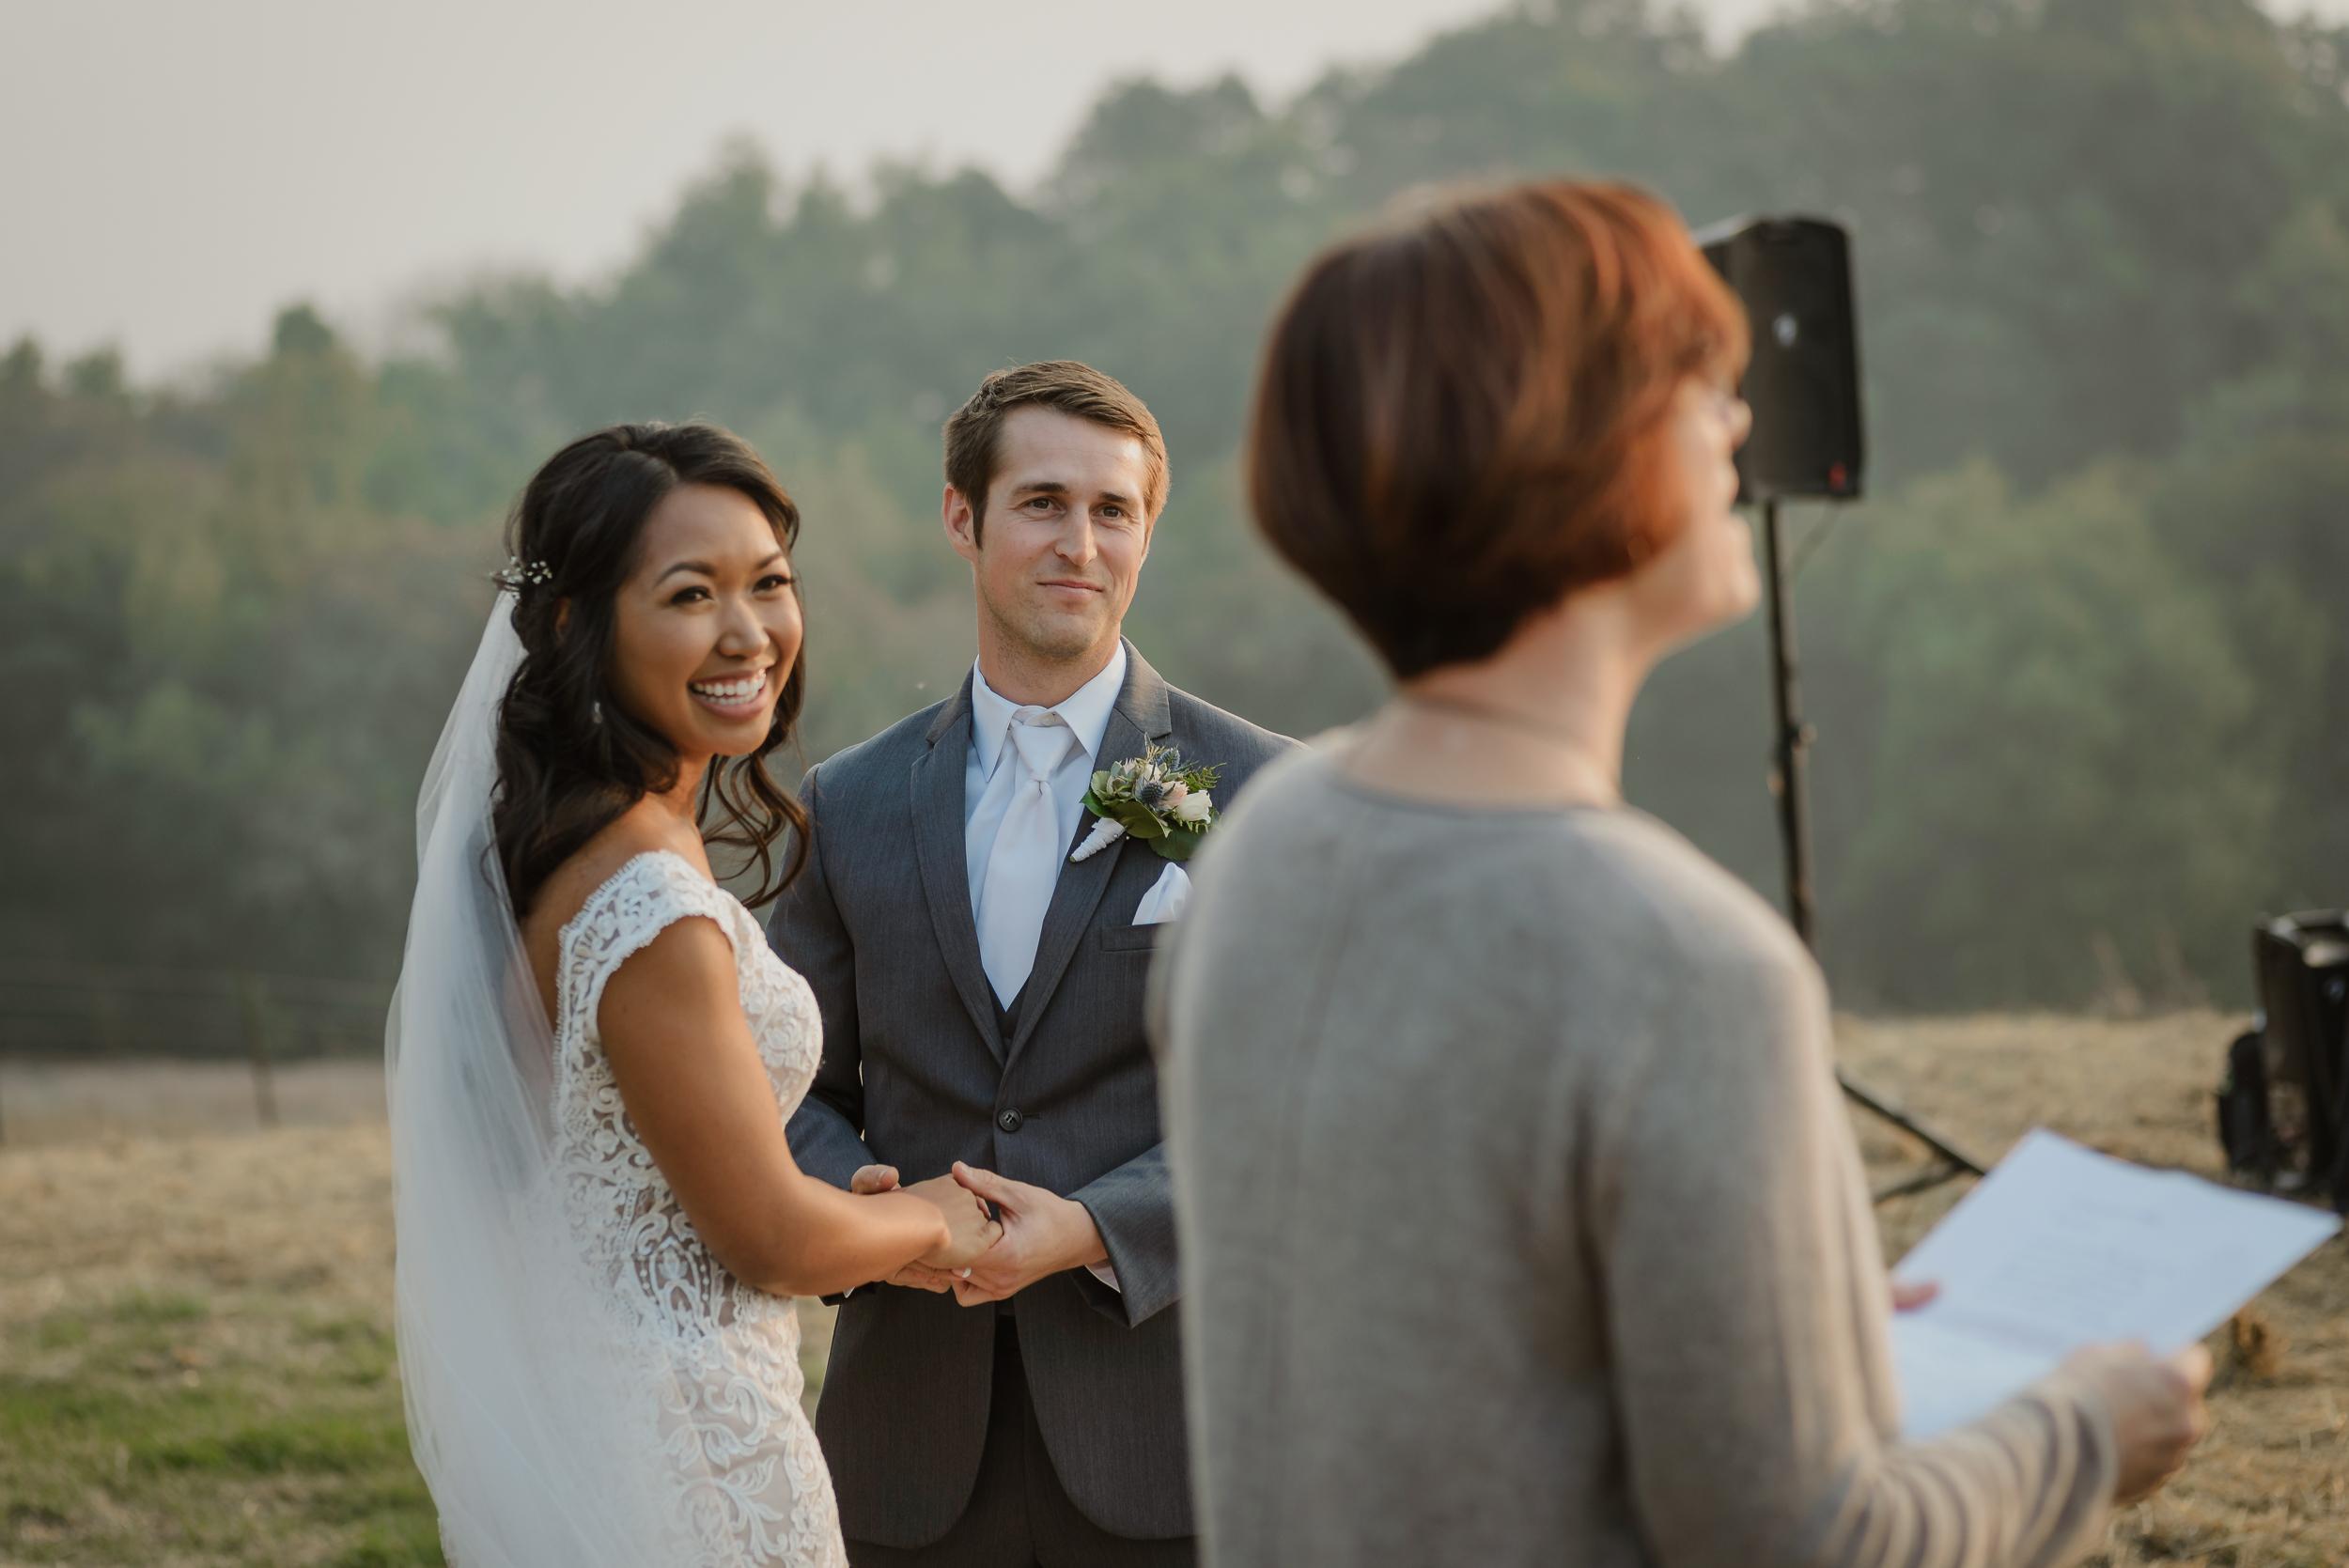 046marin-petaluma-backyard-wedding-vivianchen-298.jpg